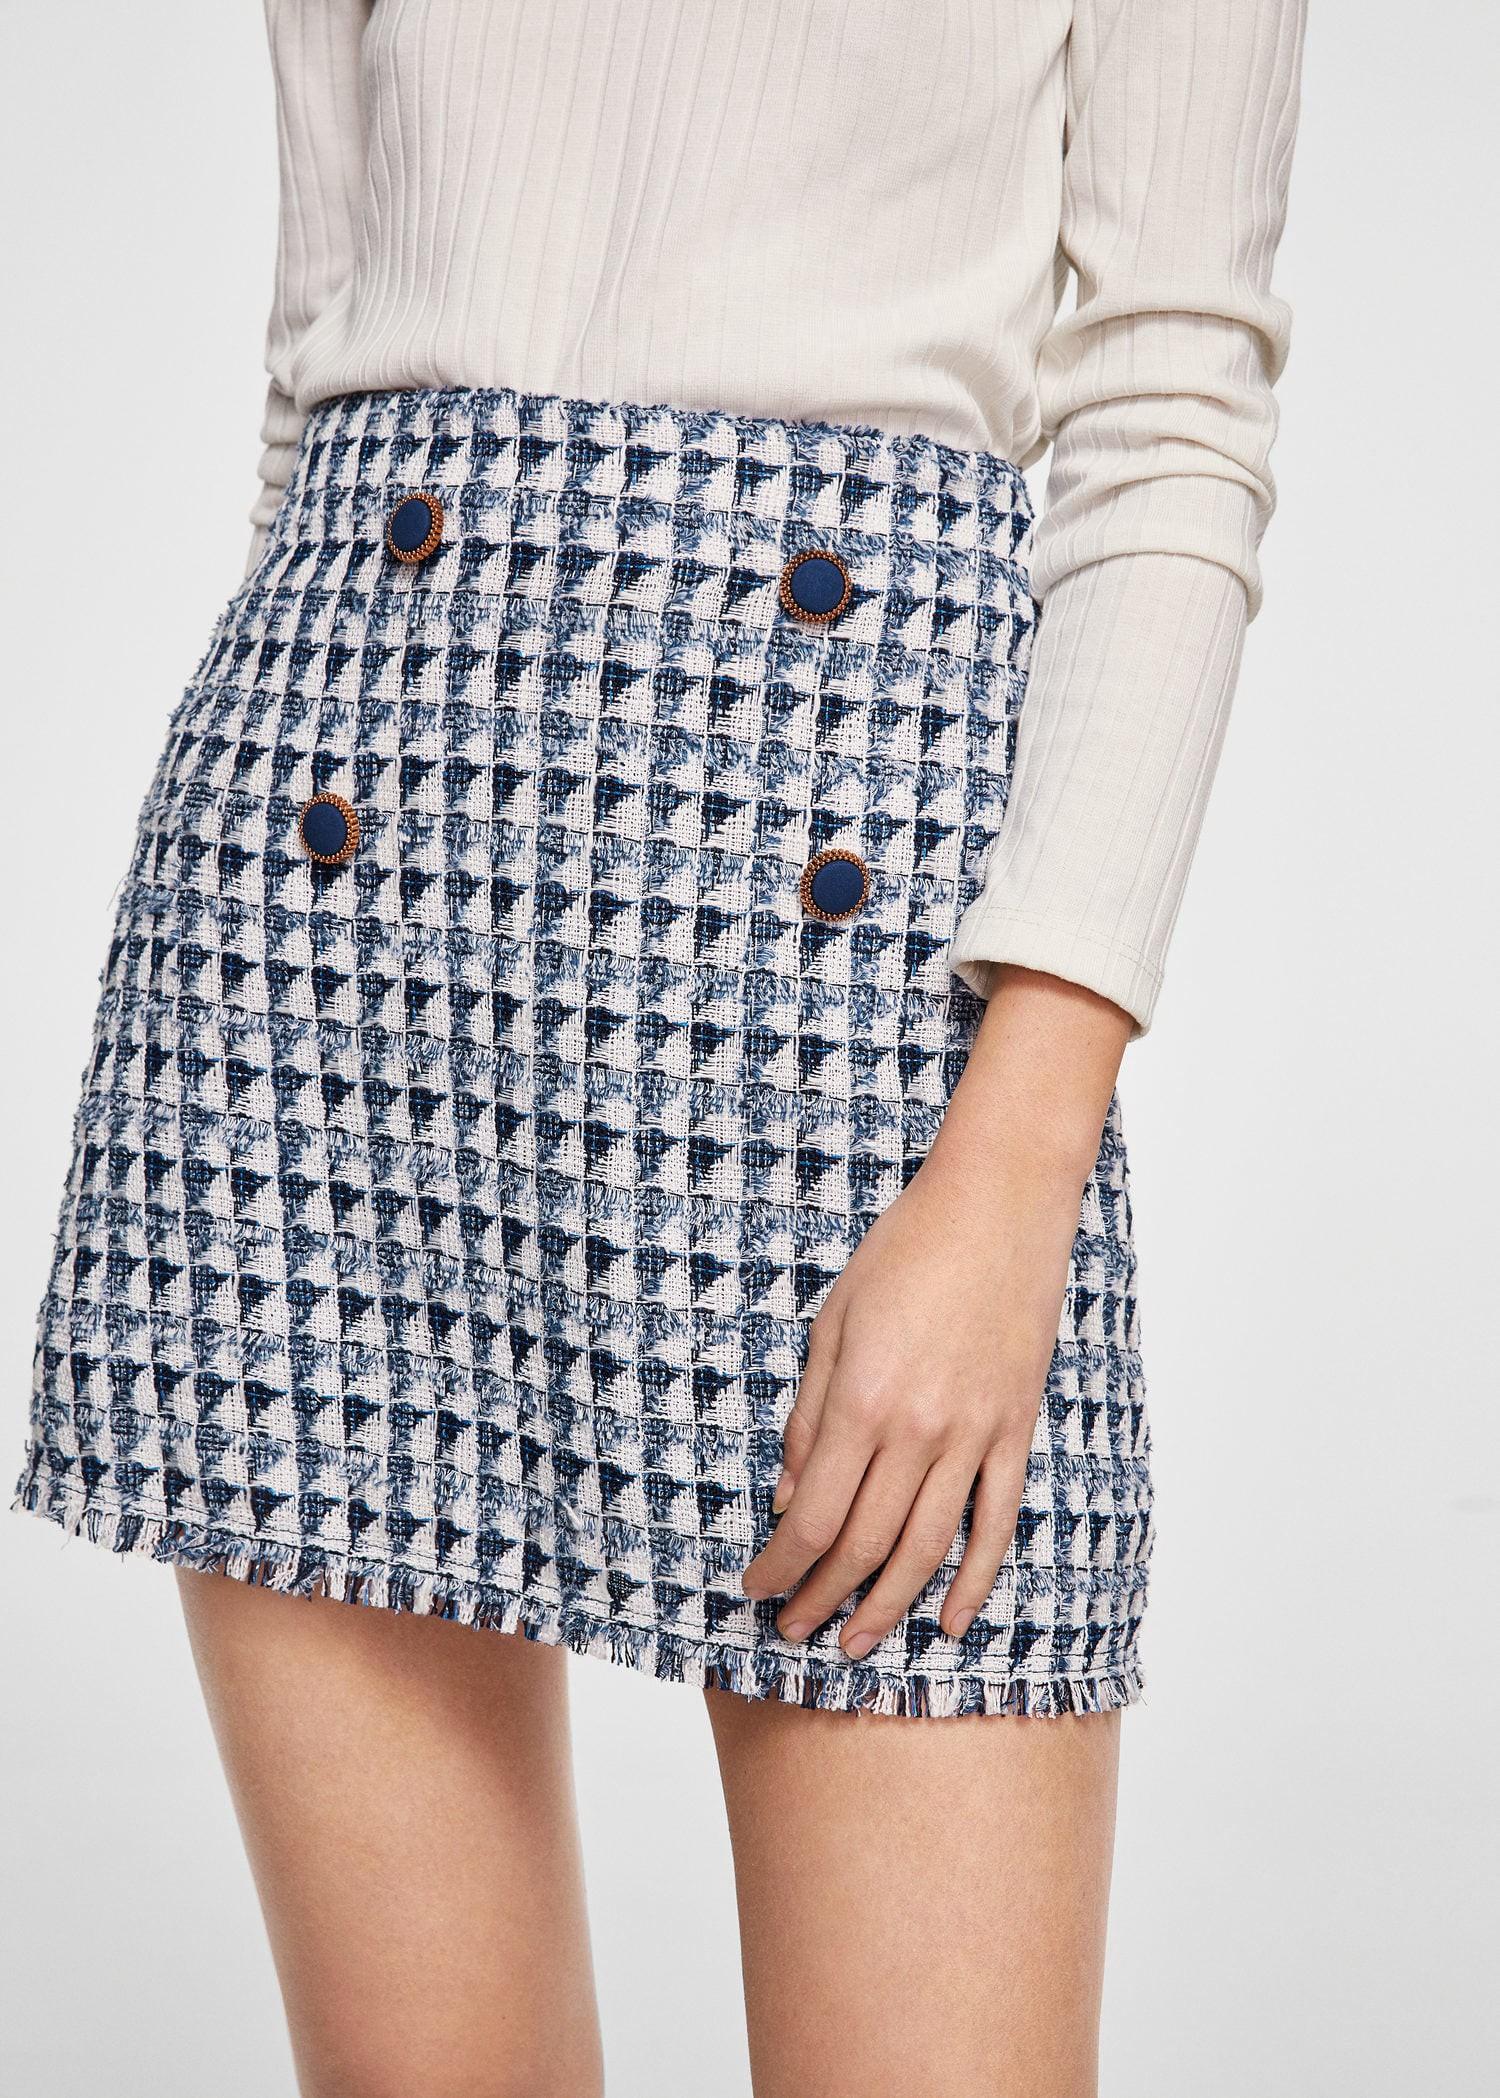 8b890def39 Mango Tweed Skirt - Women | 10 | Products | Tweed skirt, Skirts ...